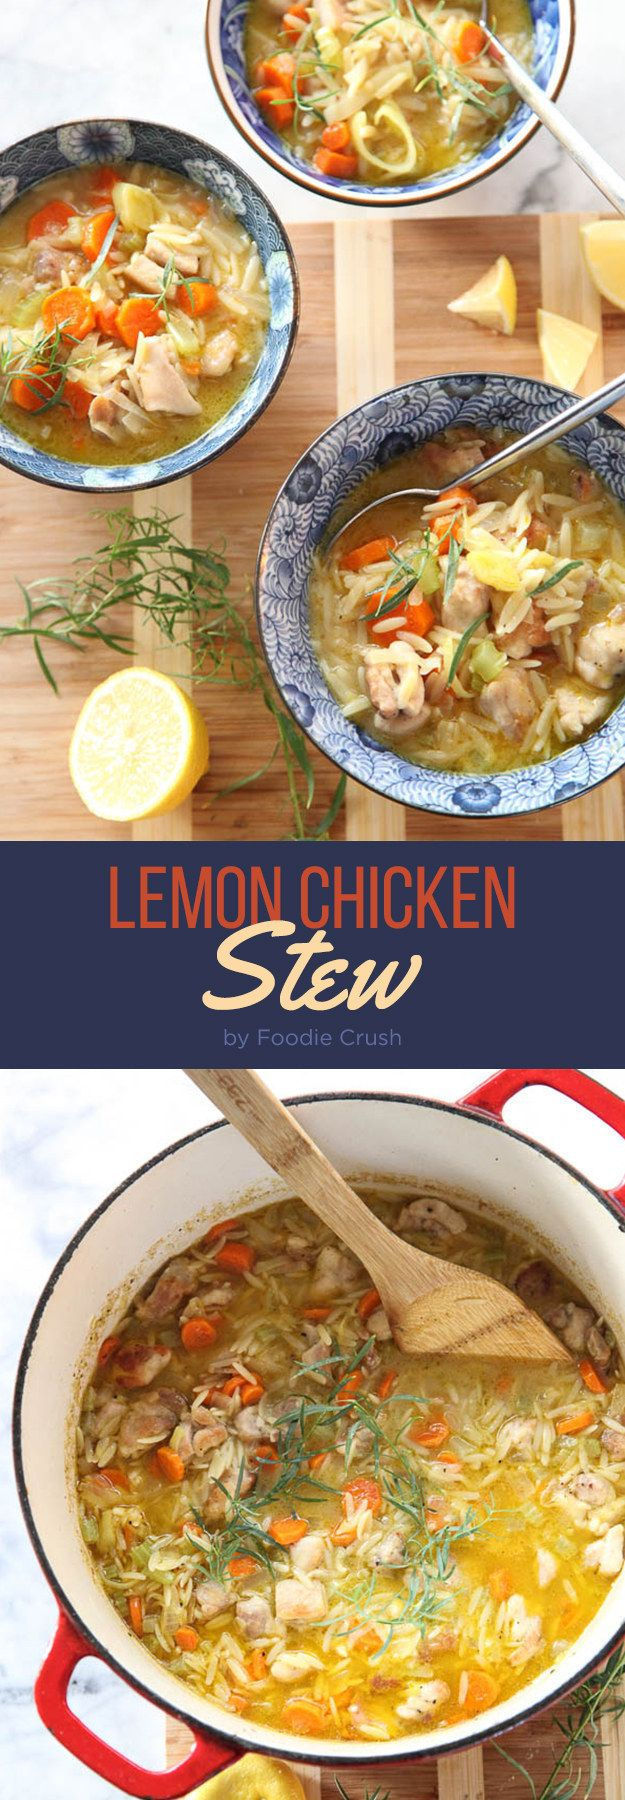 Lemon Chicken Stew   7 Easy Dinners To Make This Week